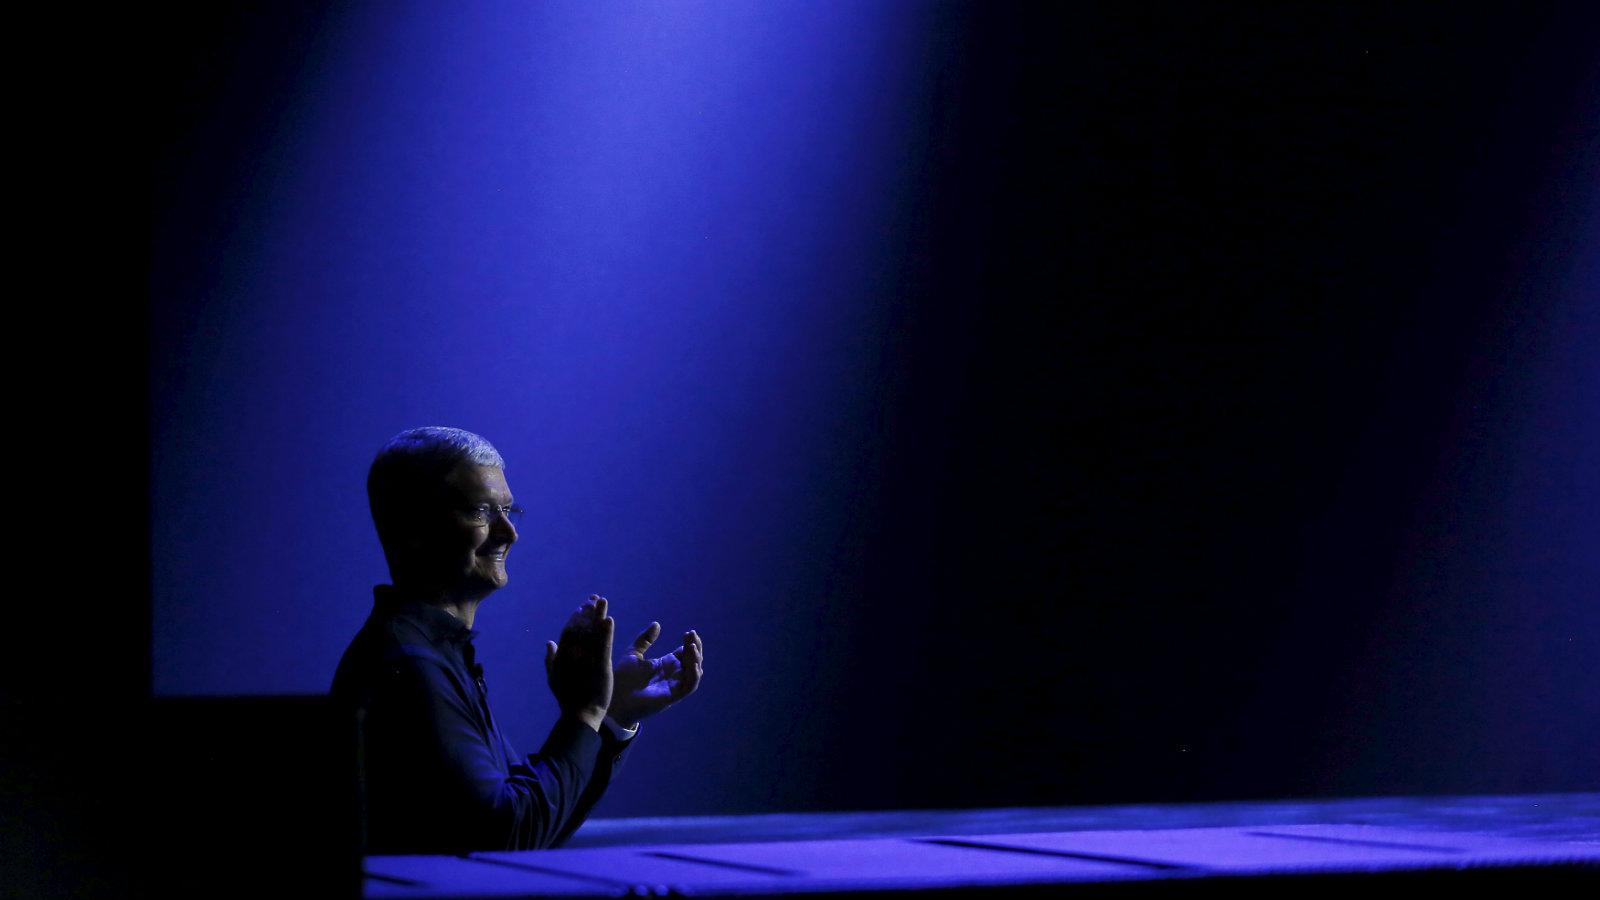 Apple-Tim Cook